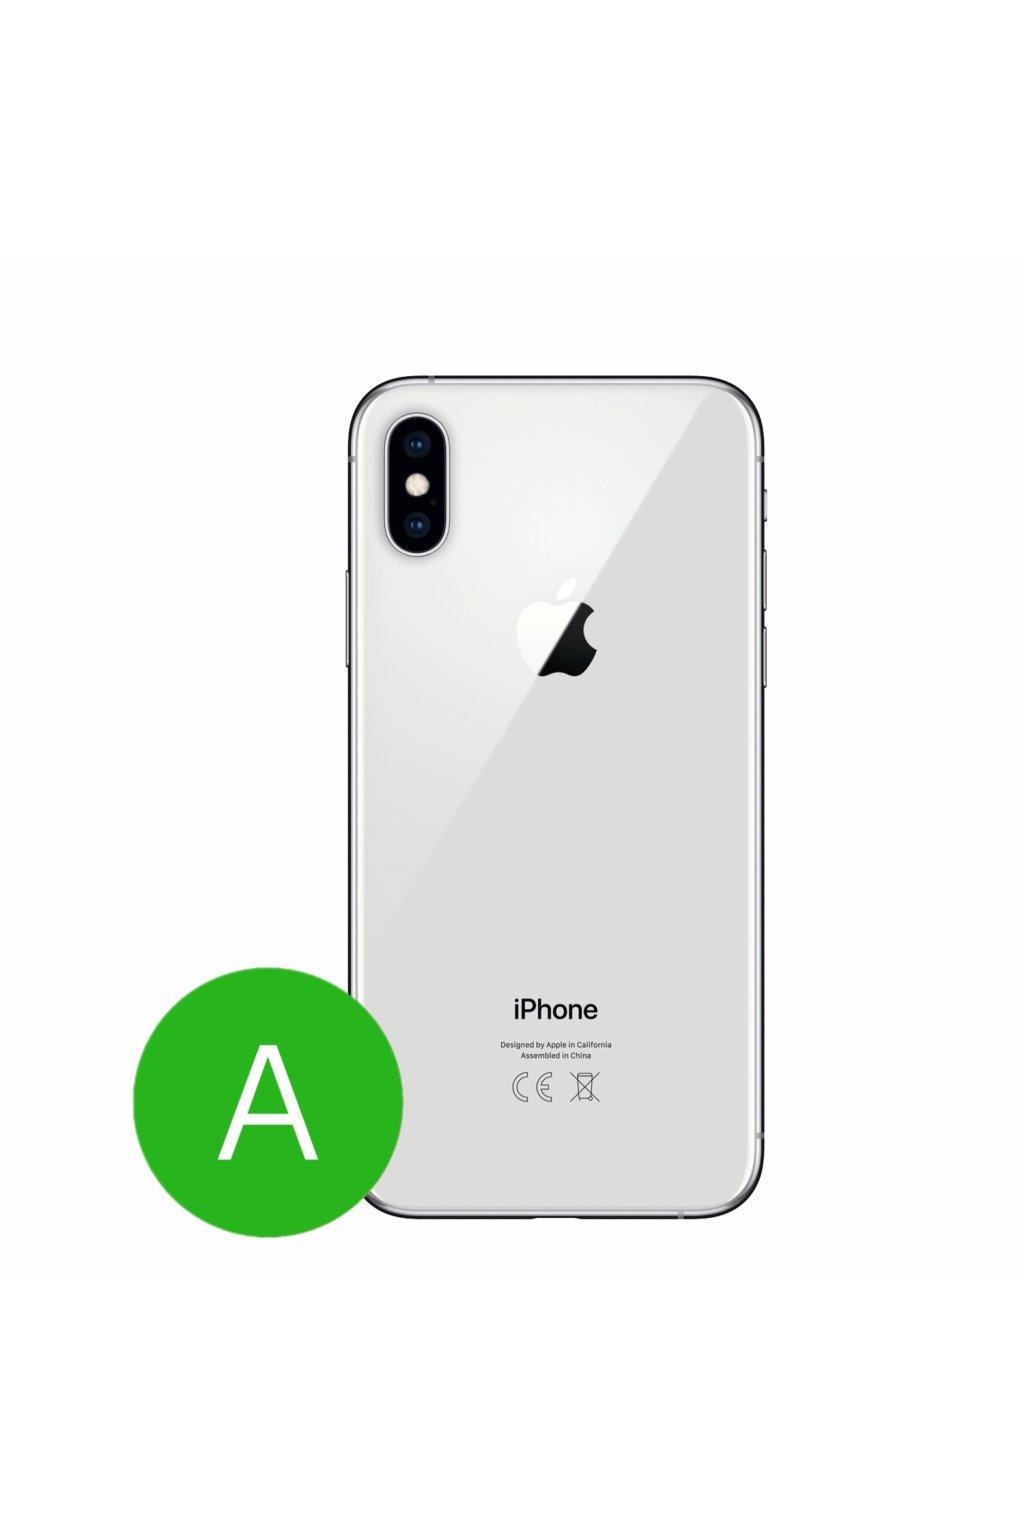 Apple iPhone XS 64GB, stříbrný - použitý